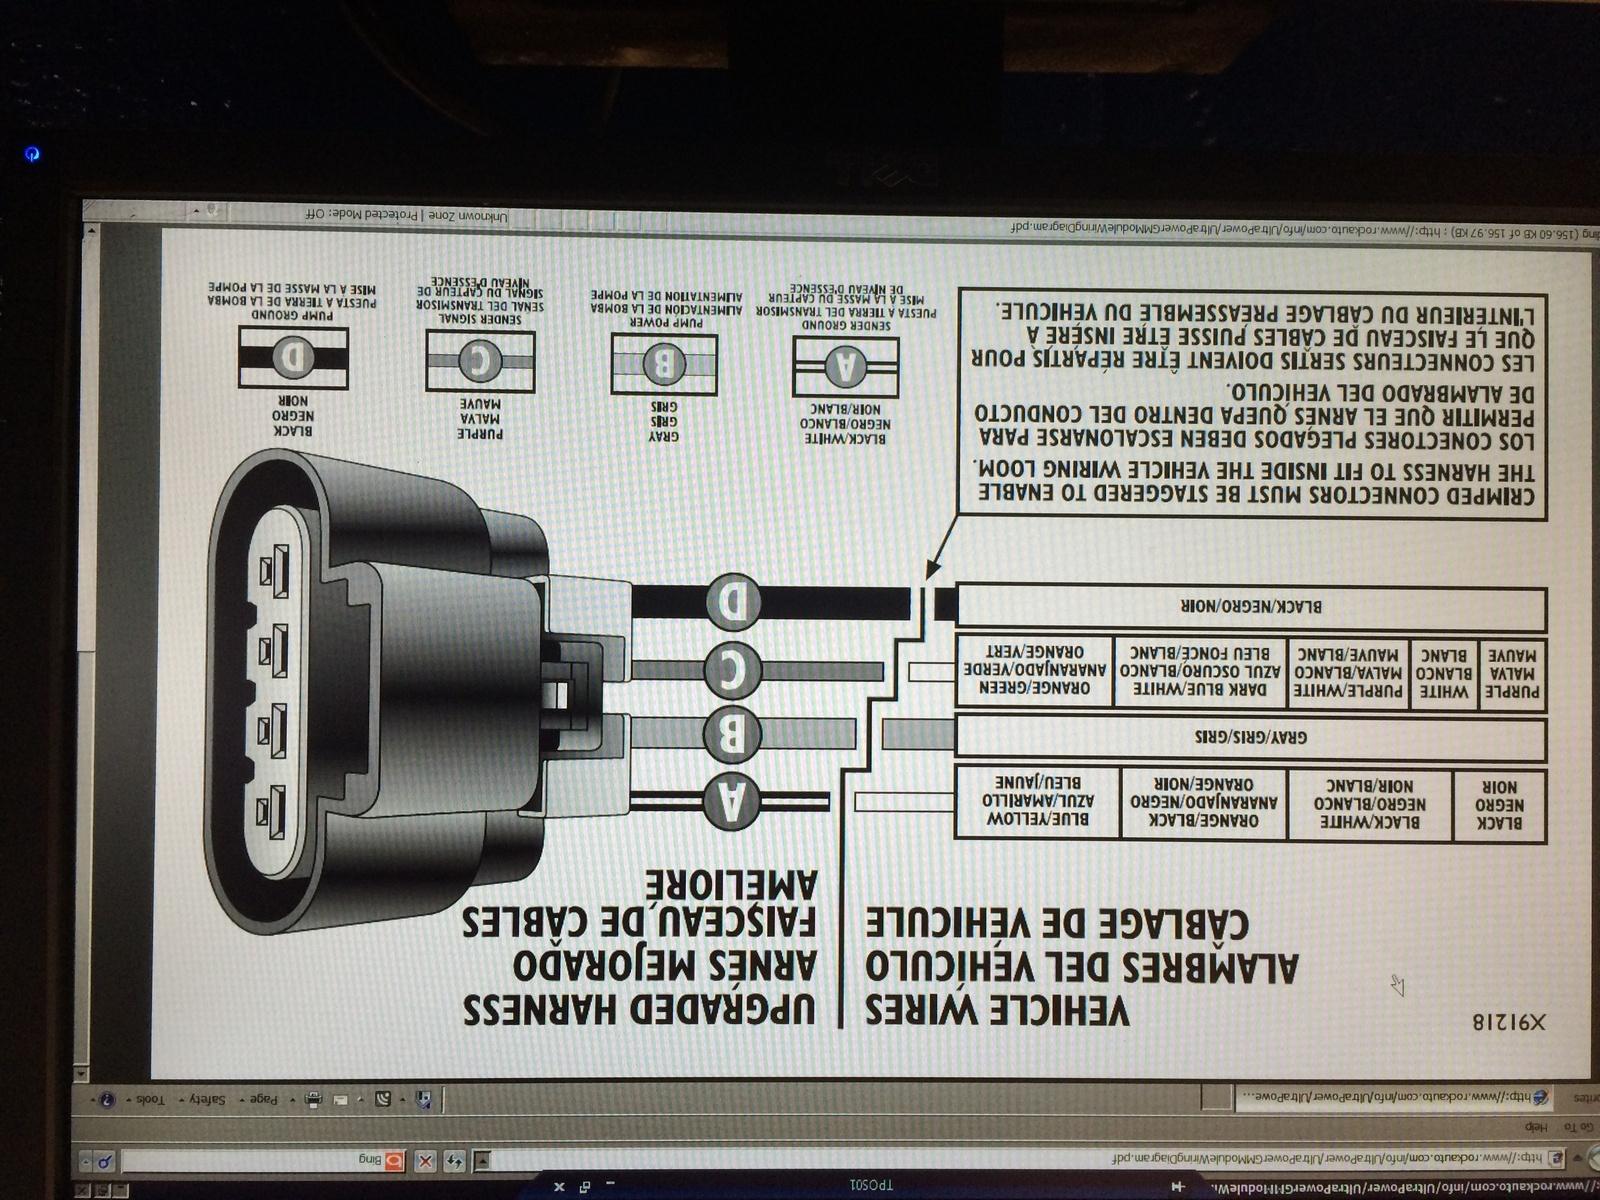 Gmc Sierra 1500 Questions - Fuel Pump Not Engaging On 1998 Gmc K1500 - 1993 Chevy 1500 Fuel Pump Wiring Diagram